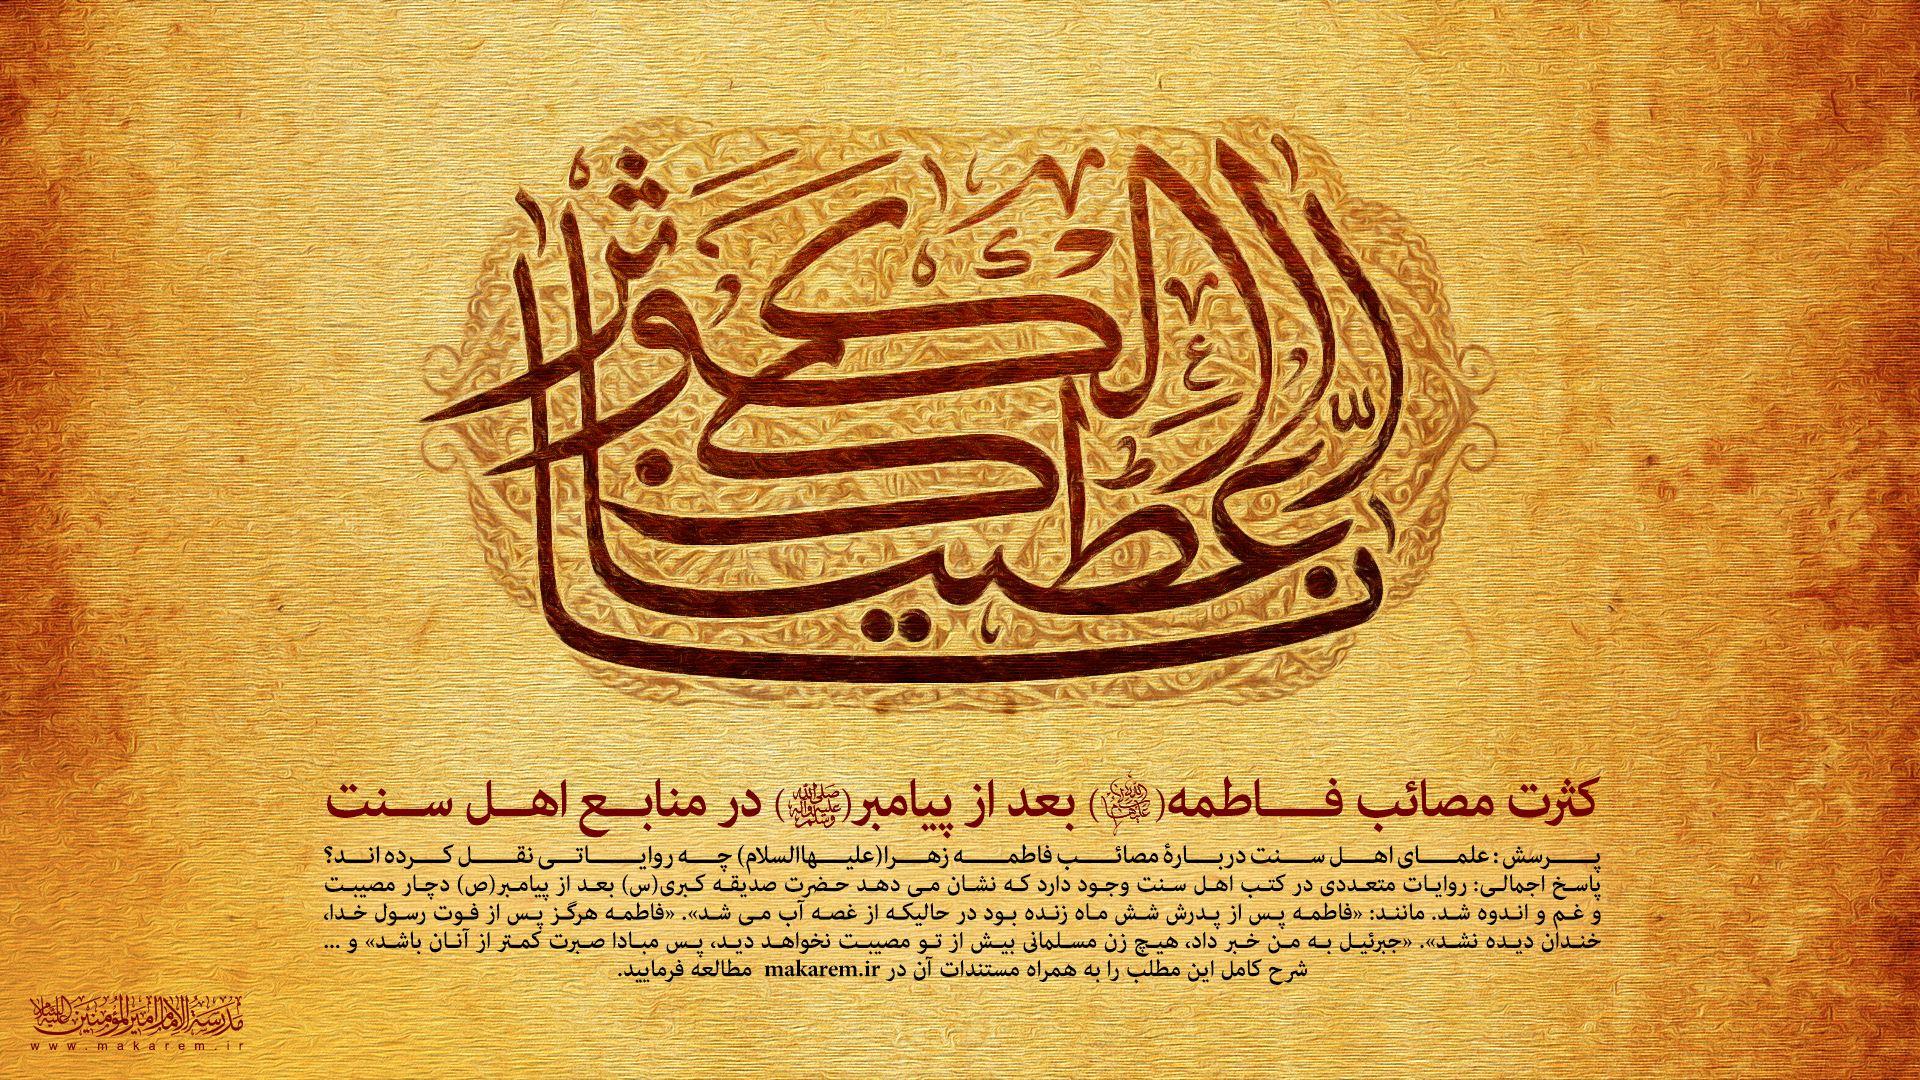 حضرت مادر 02-مدرسه الامام امیر المومنین (ع)